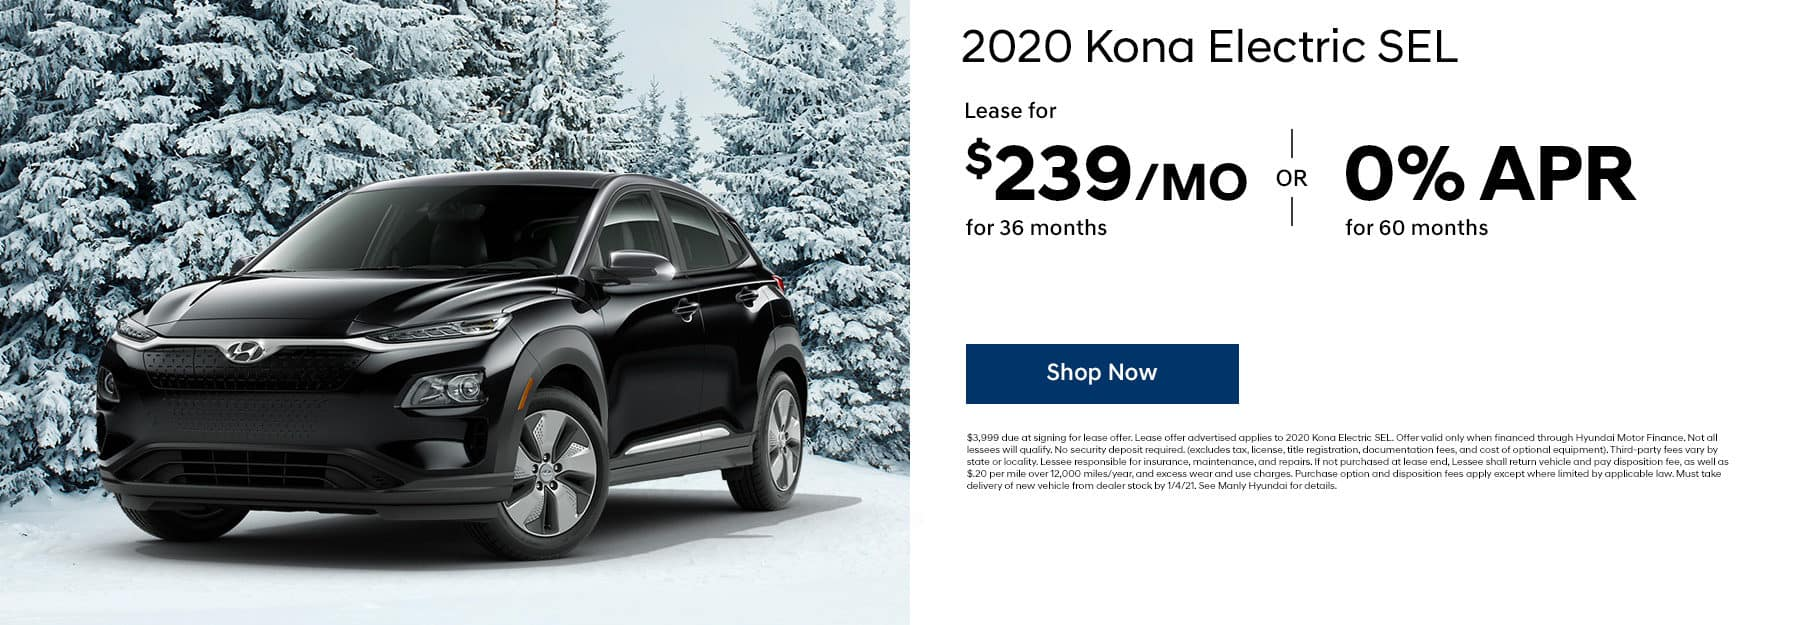 2020 Kona Electric SEL